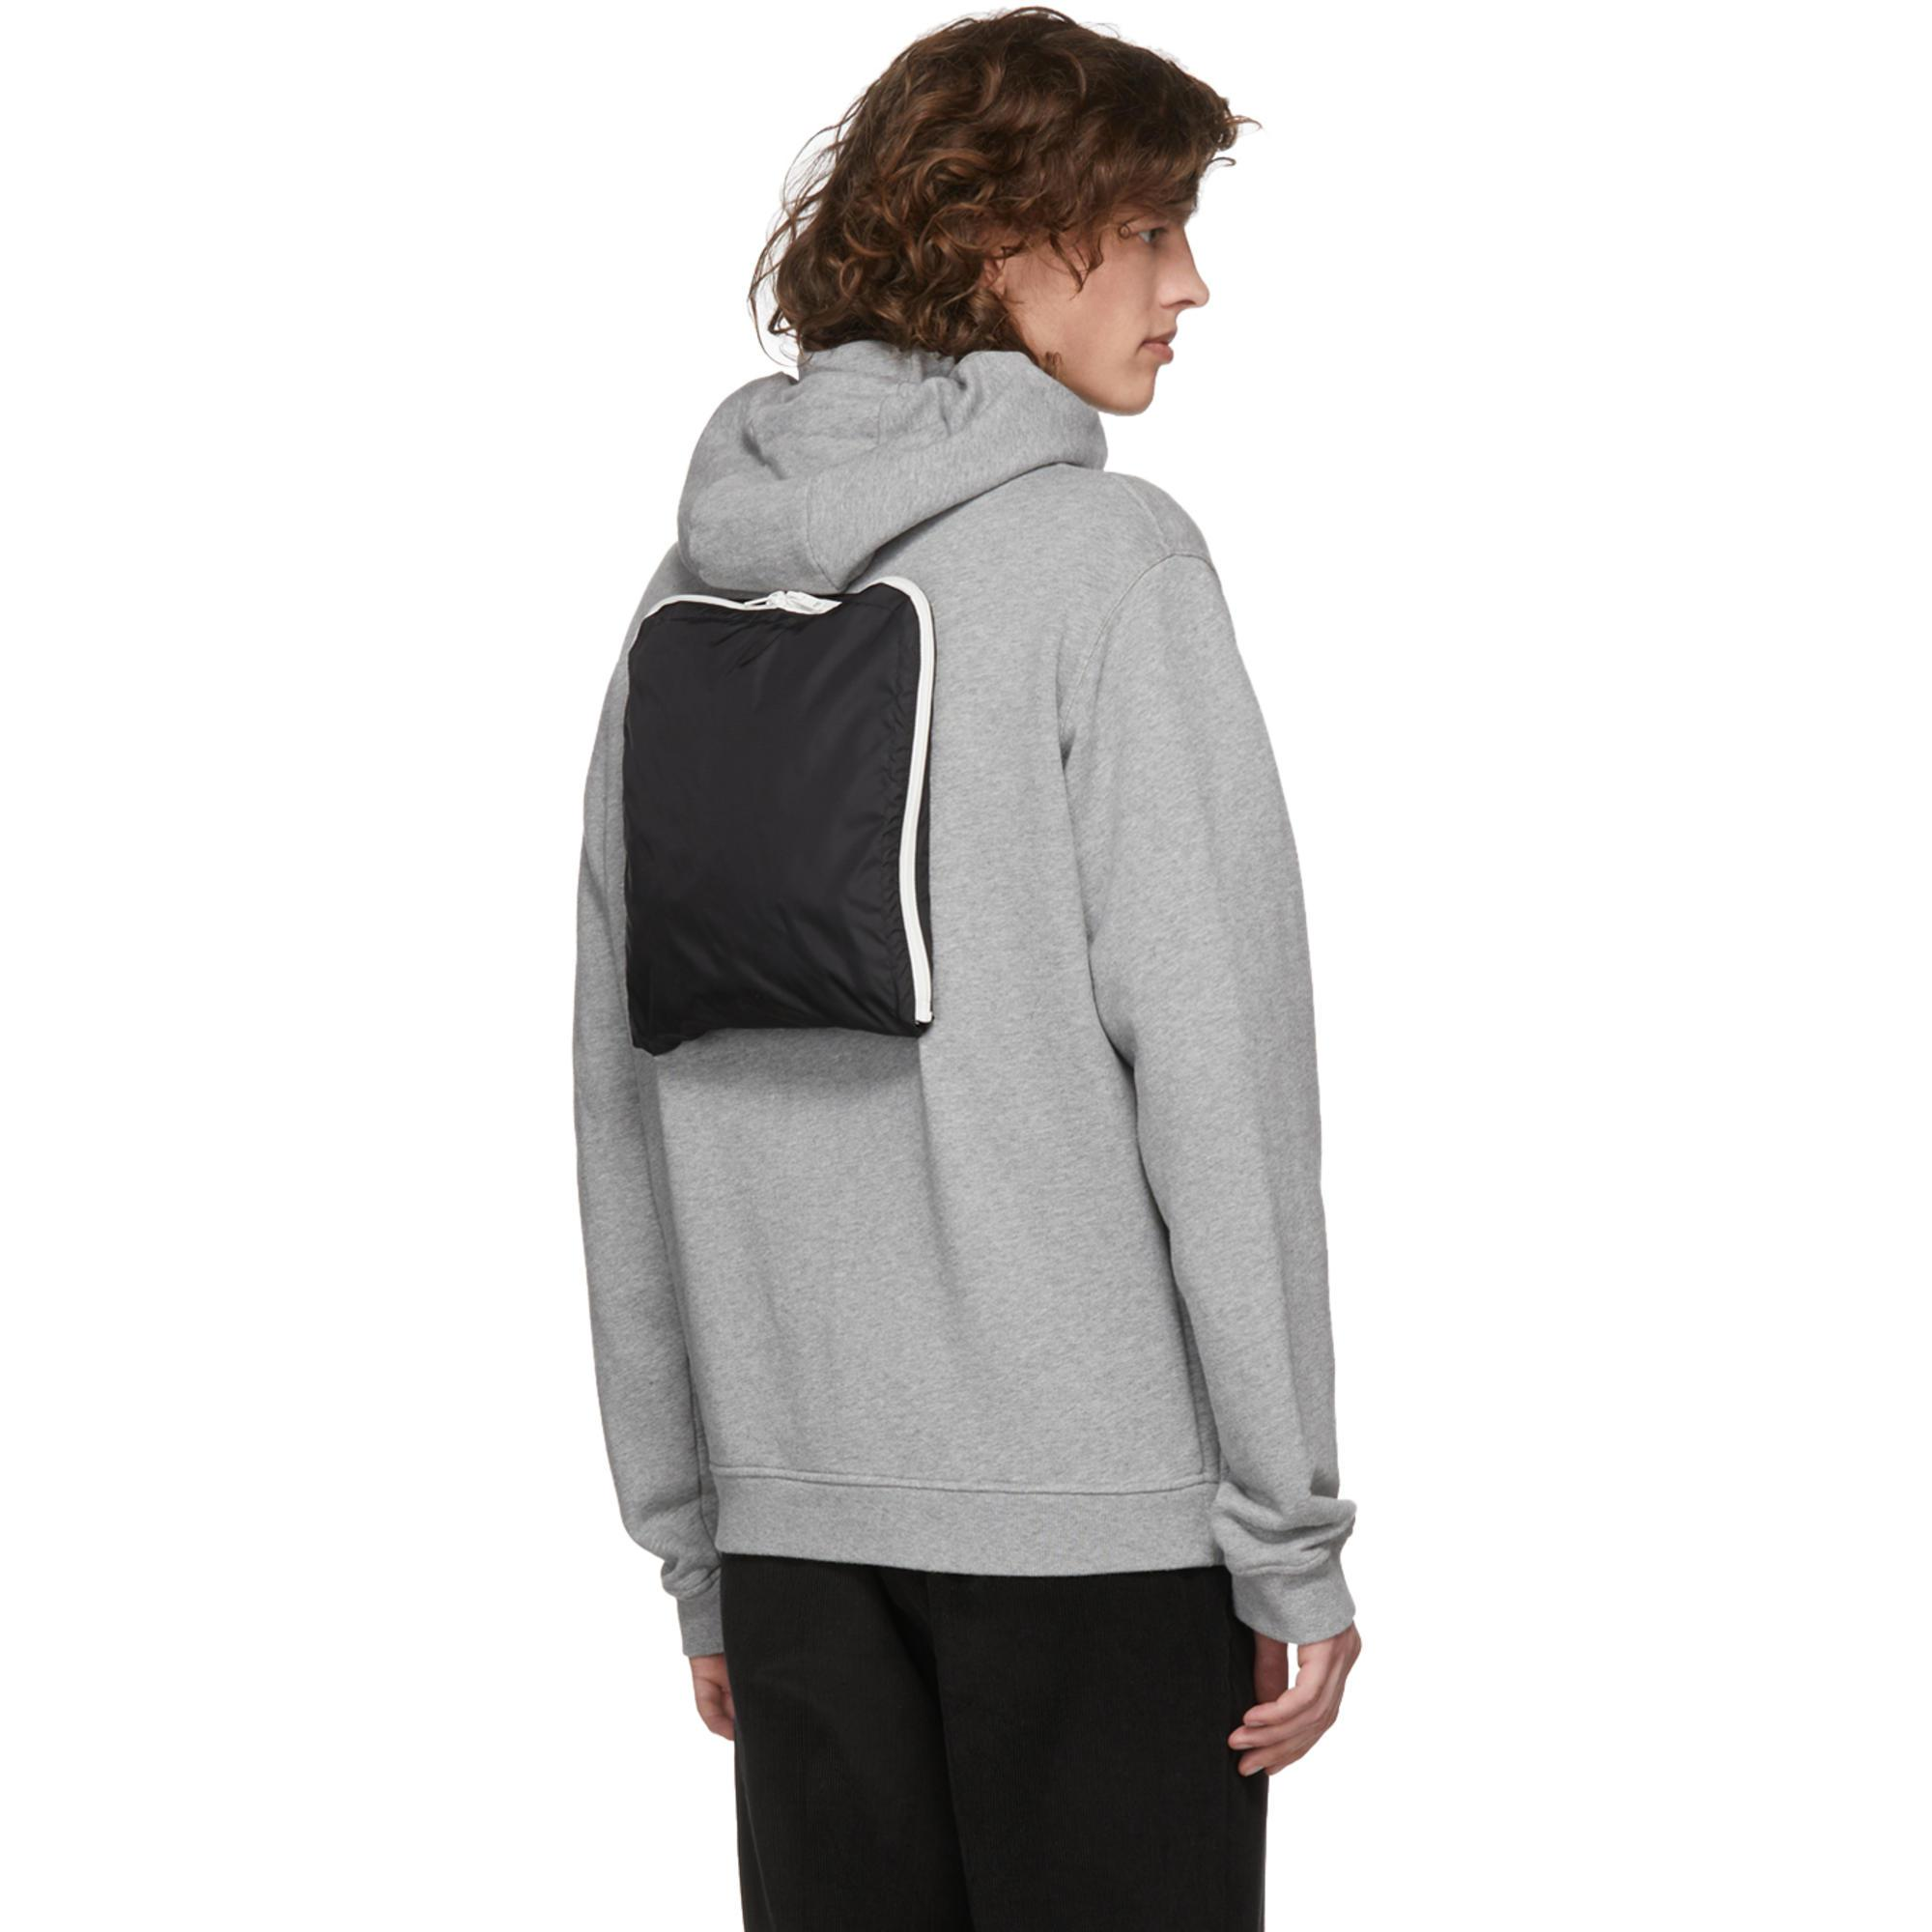 Maison Margiela Synthetic Black And Grey Hybrid Hoodie Jacket for Men